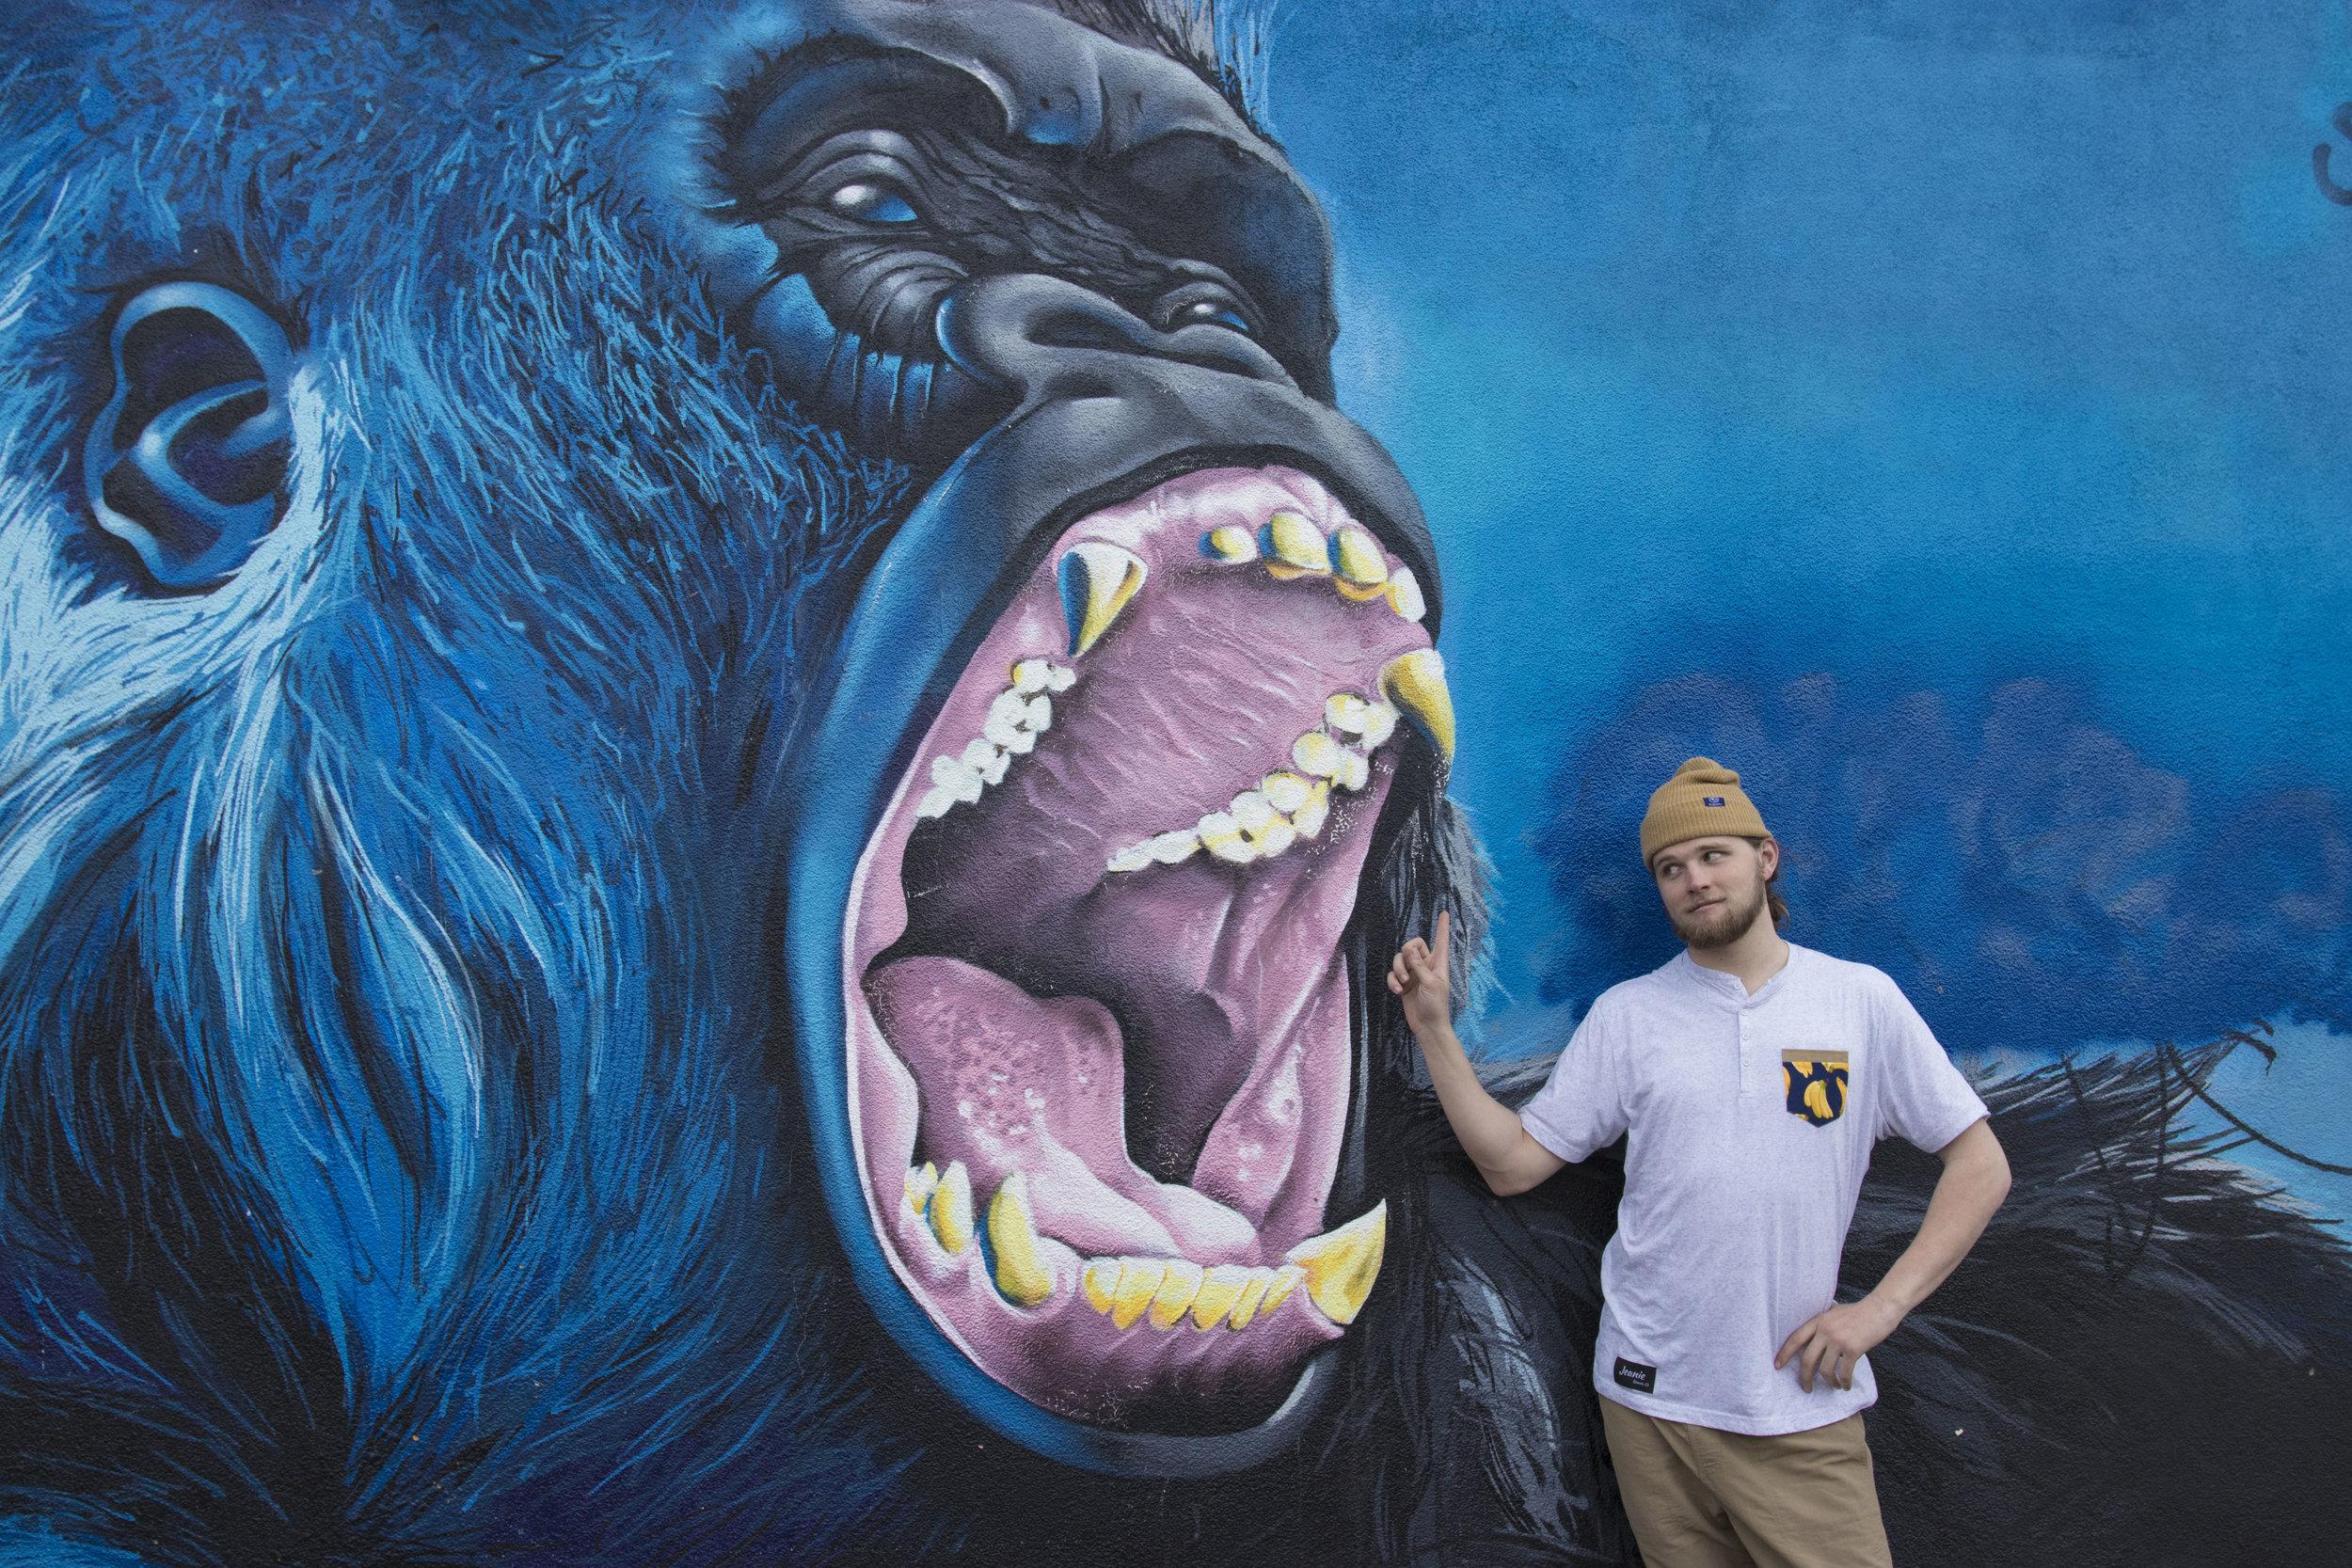 Gorilla_Cant_have_my_pocket.jpg